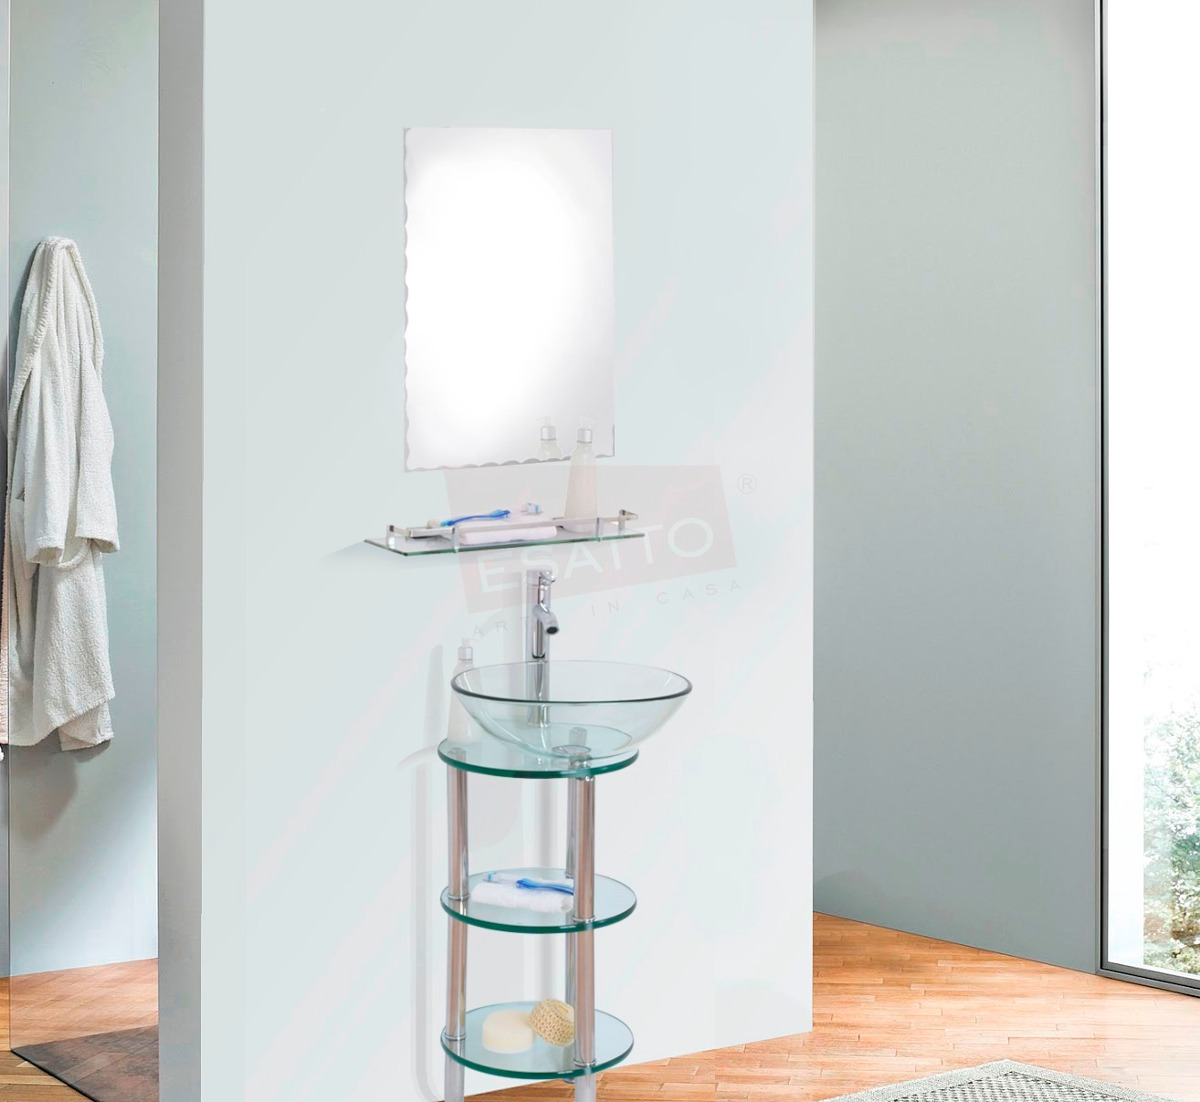 Esatto mueble ba o lavabo cristal espejo repisa mv 002 for Lavabo vidrio